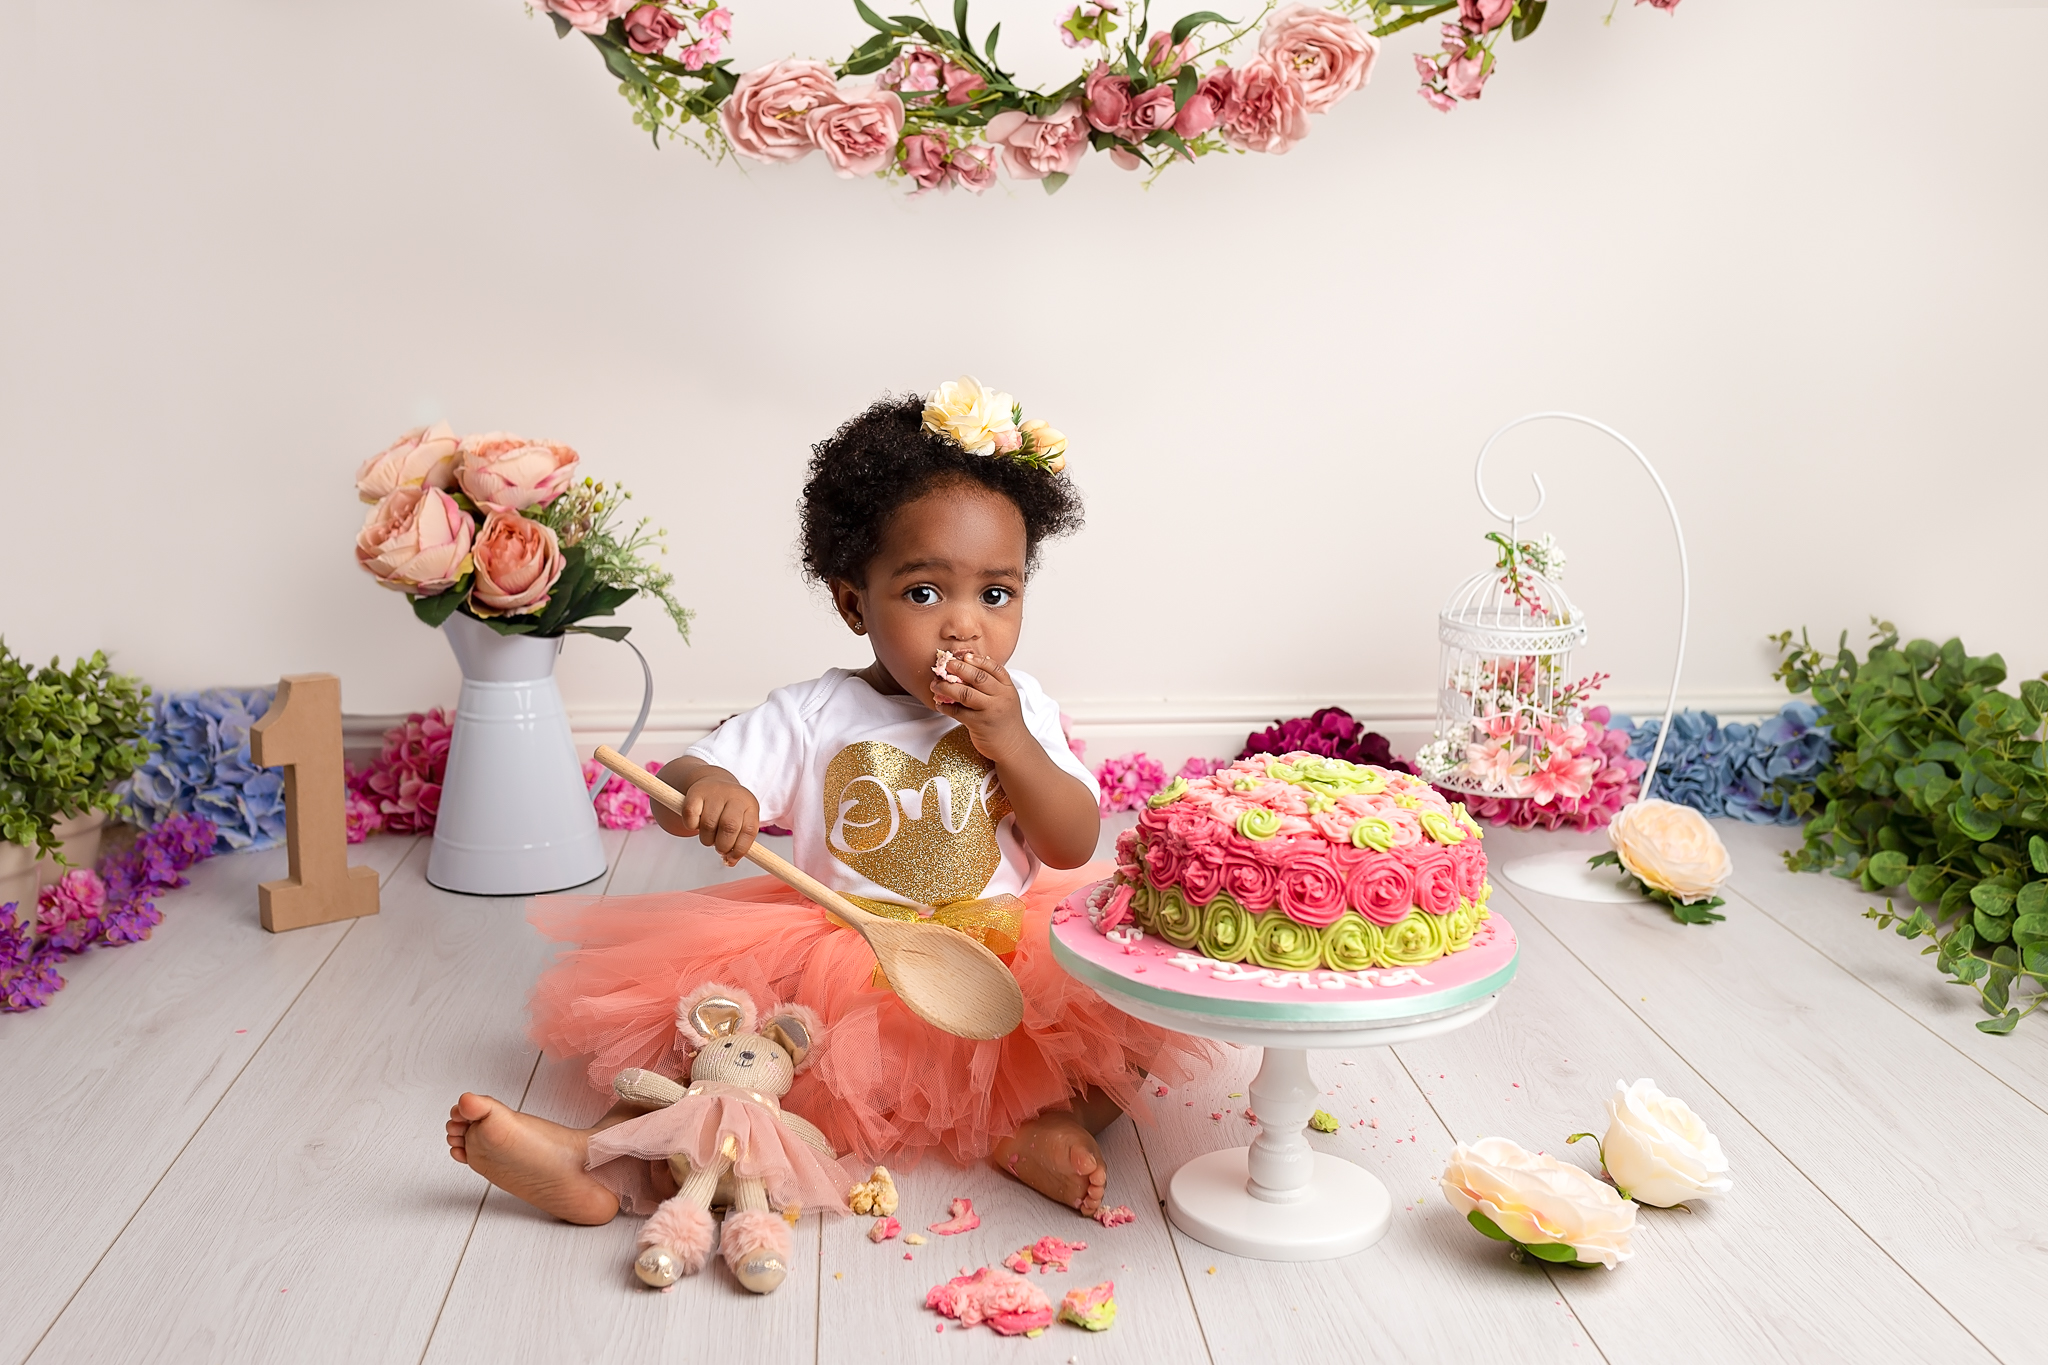 Professional baby photography Leeds, Bradford, York, Harrogate, Wakefield: baby girl cake smash session in Leeds, West Yorkshire